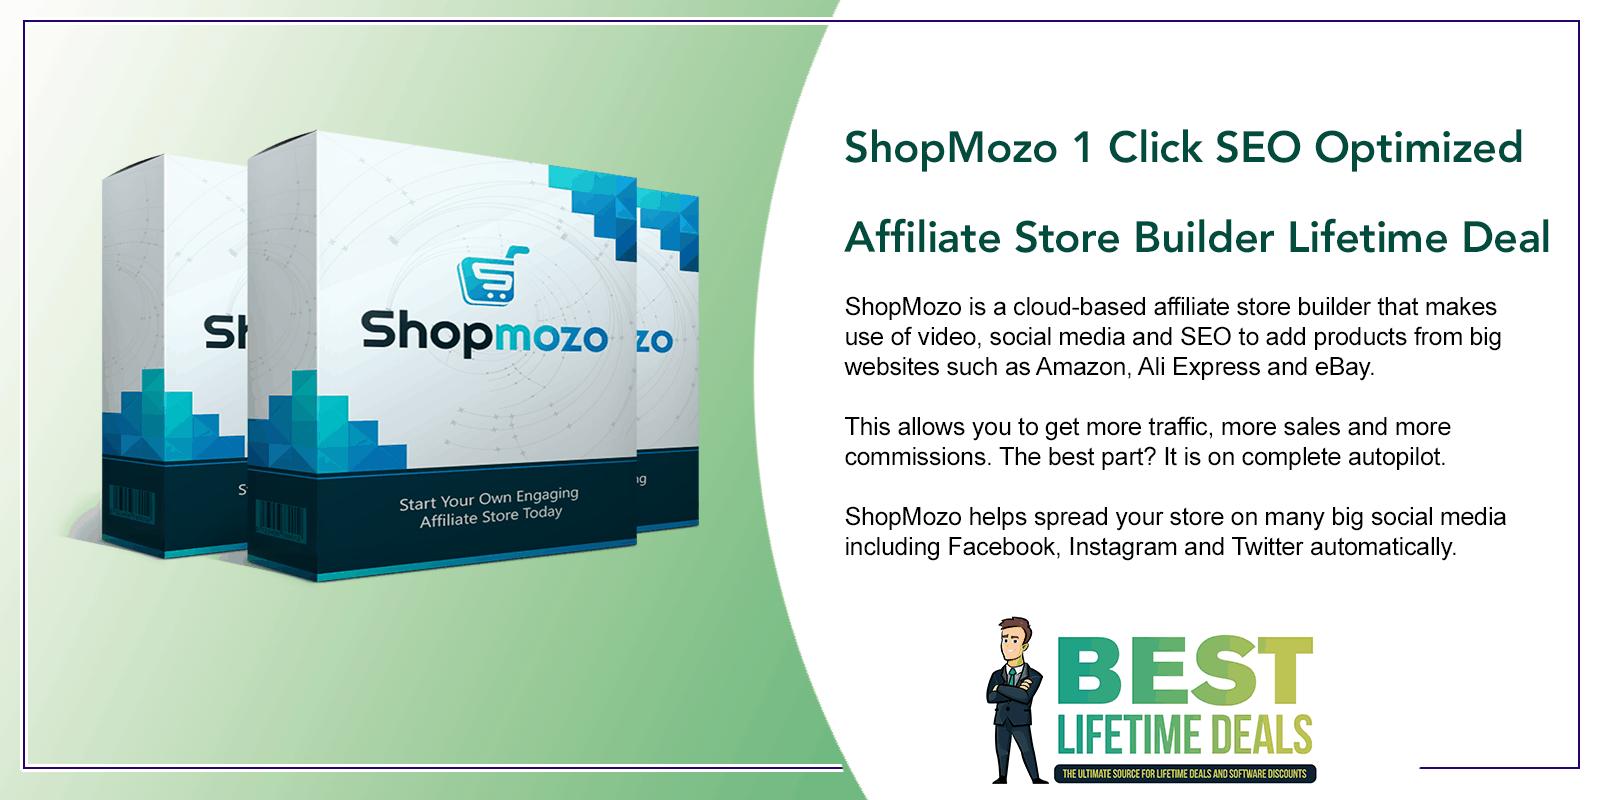 ShopMozo 1 Click SEO Optimized Featured Image